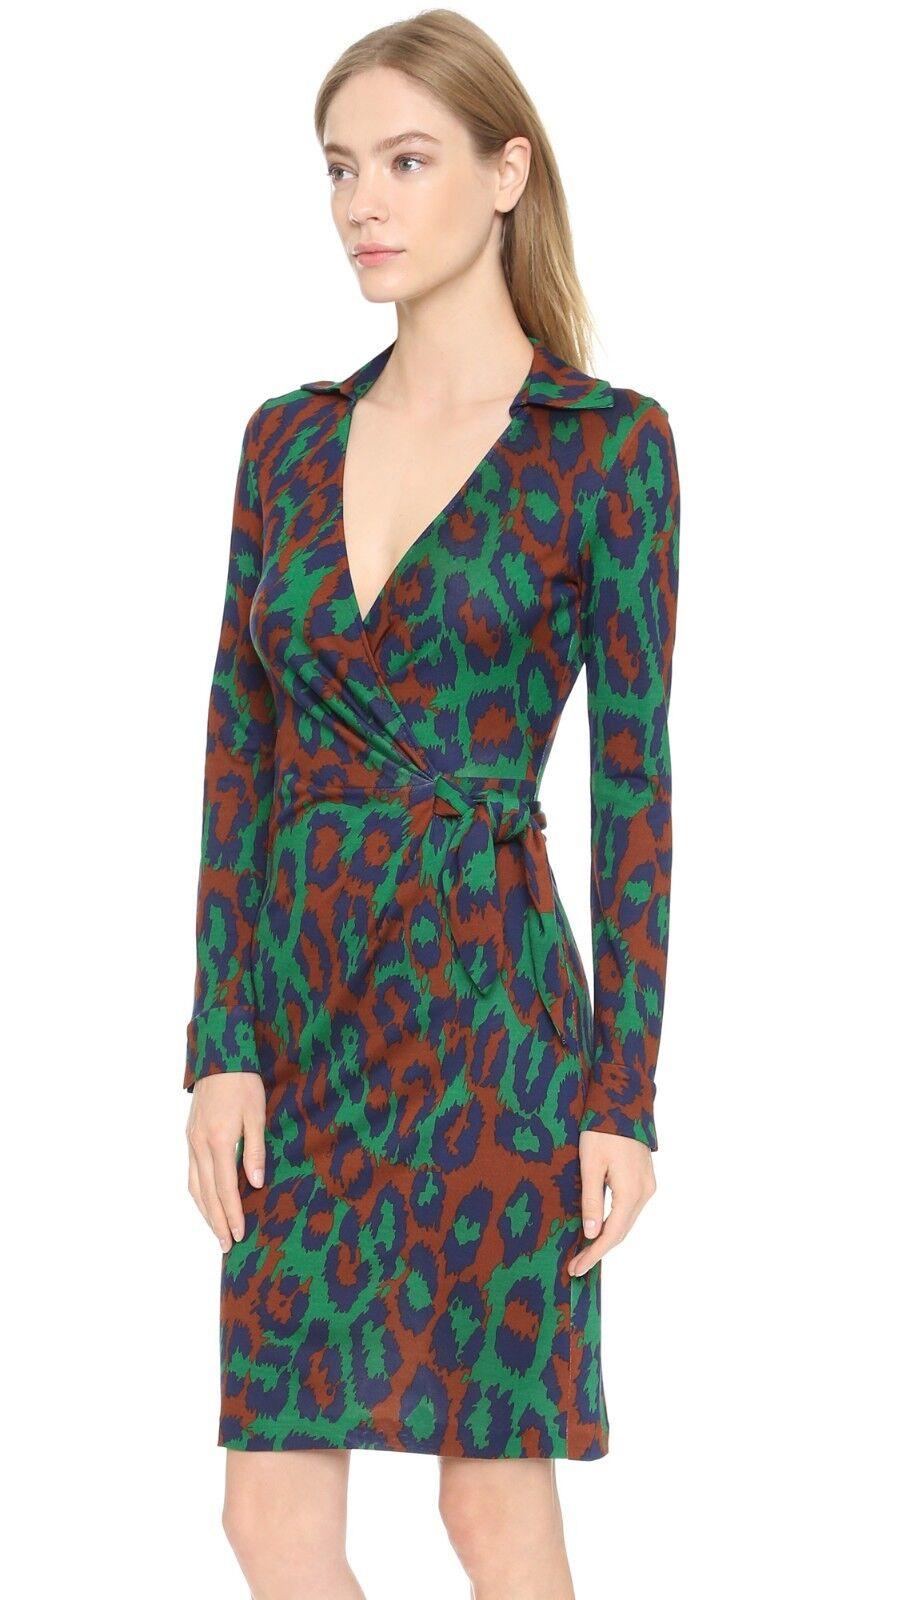 Diane Diane Diane Von Furstenberg  468 Leopard Savannah Dress Size 8 e9a66d